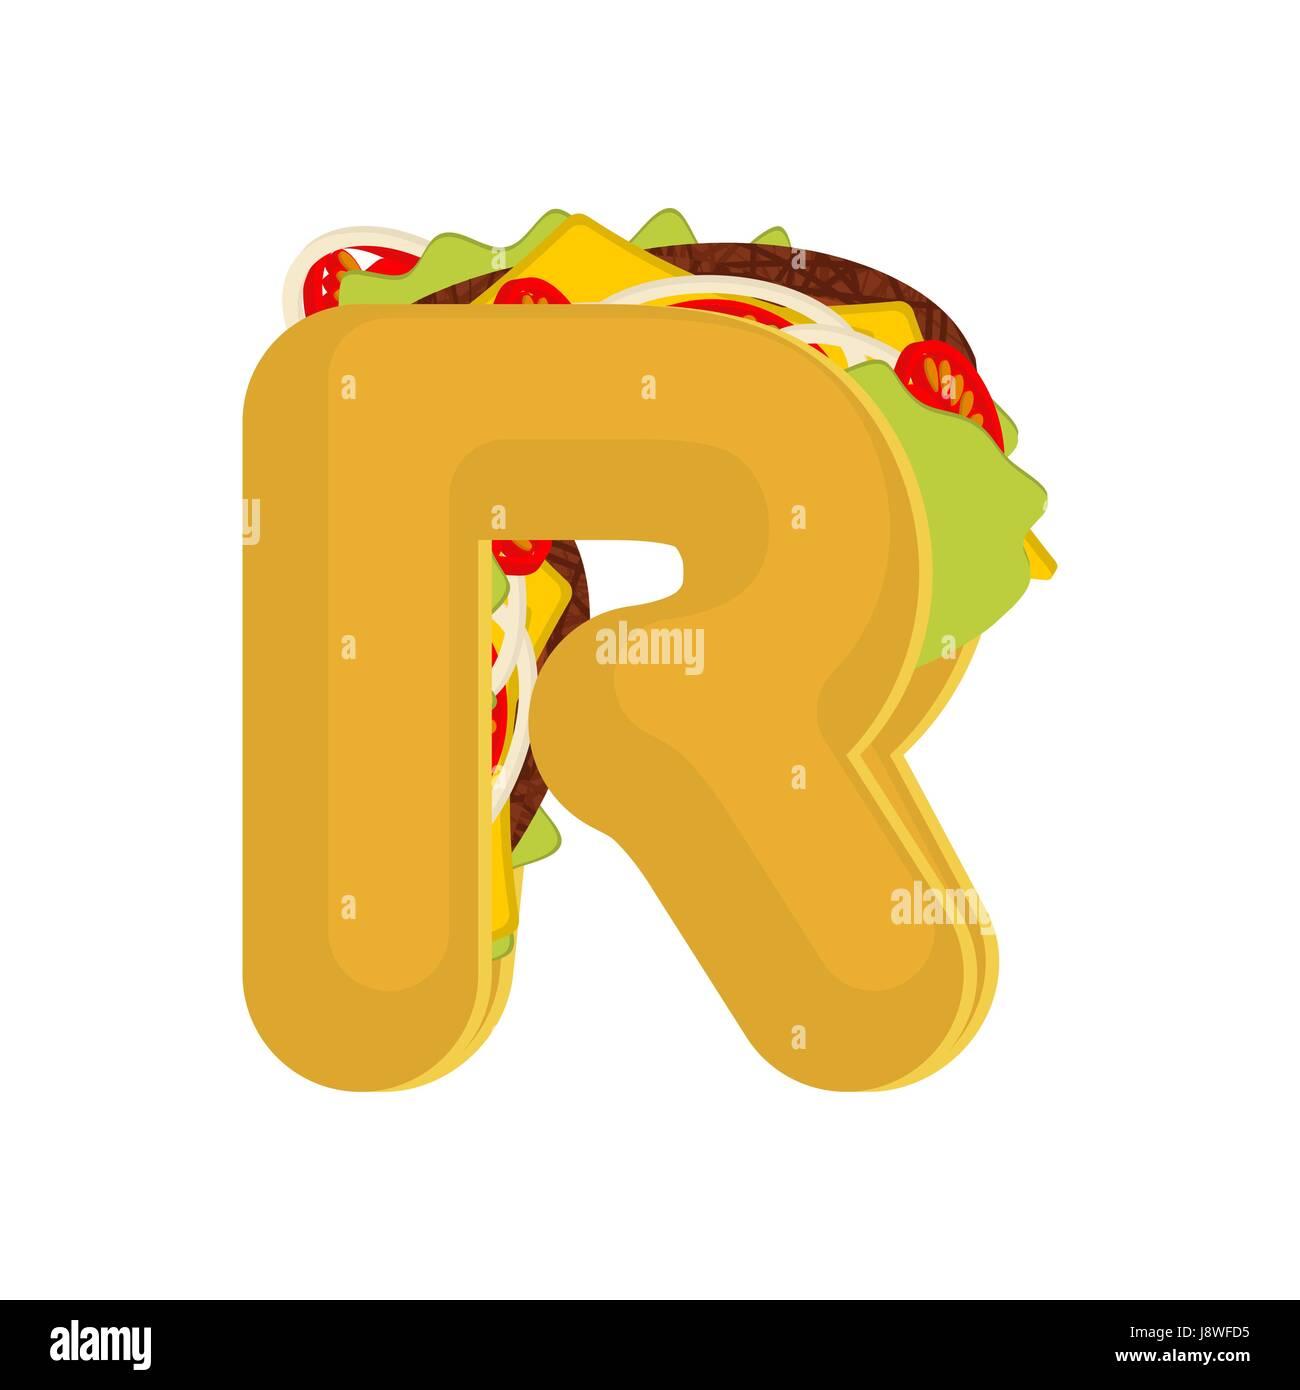 Letter R Tacos Mexican Fast Food Font Taco Alphabet Symbol Mexico